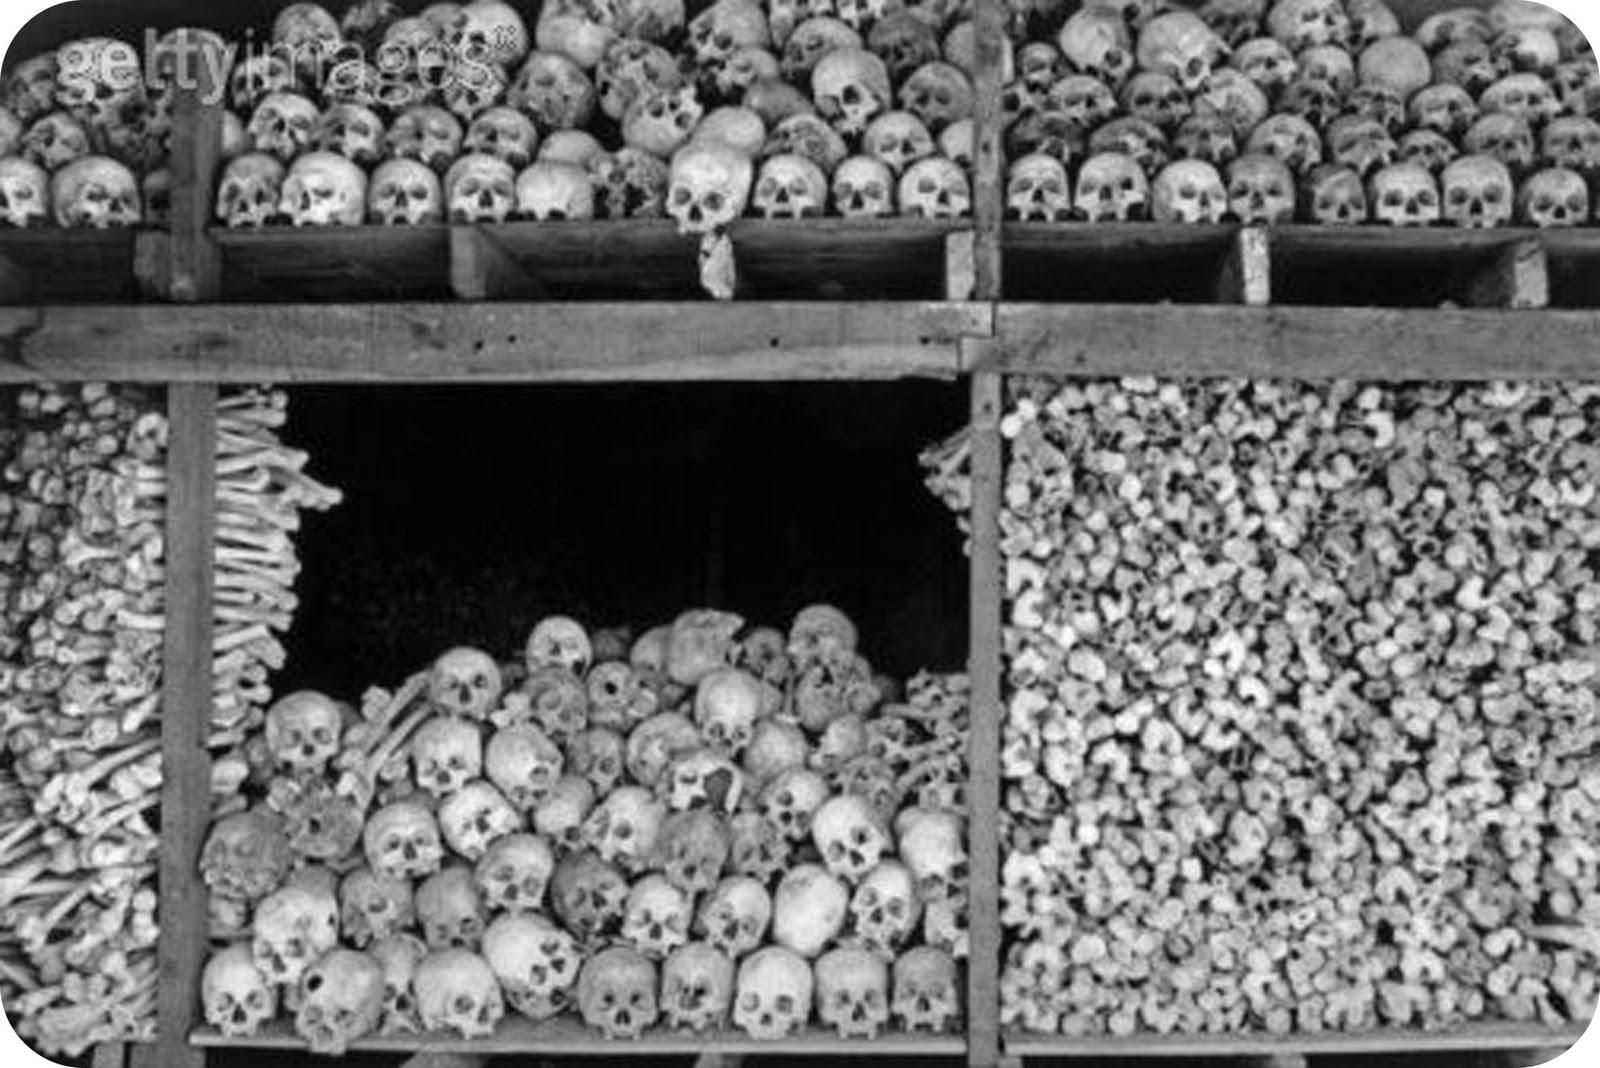 lemmemakeit: piles of bones